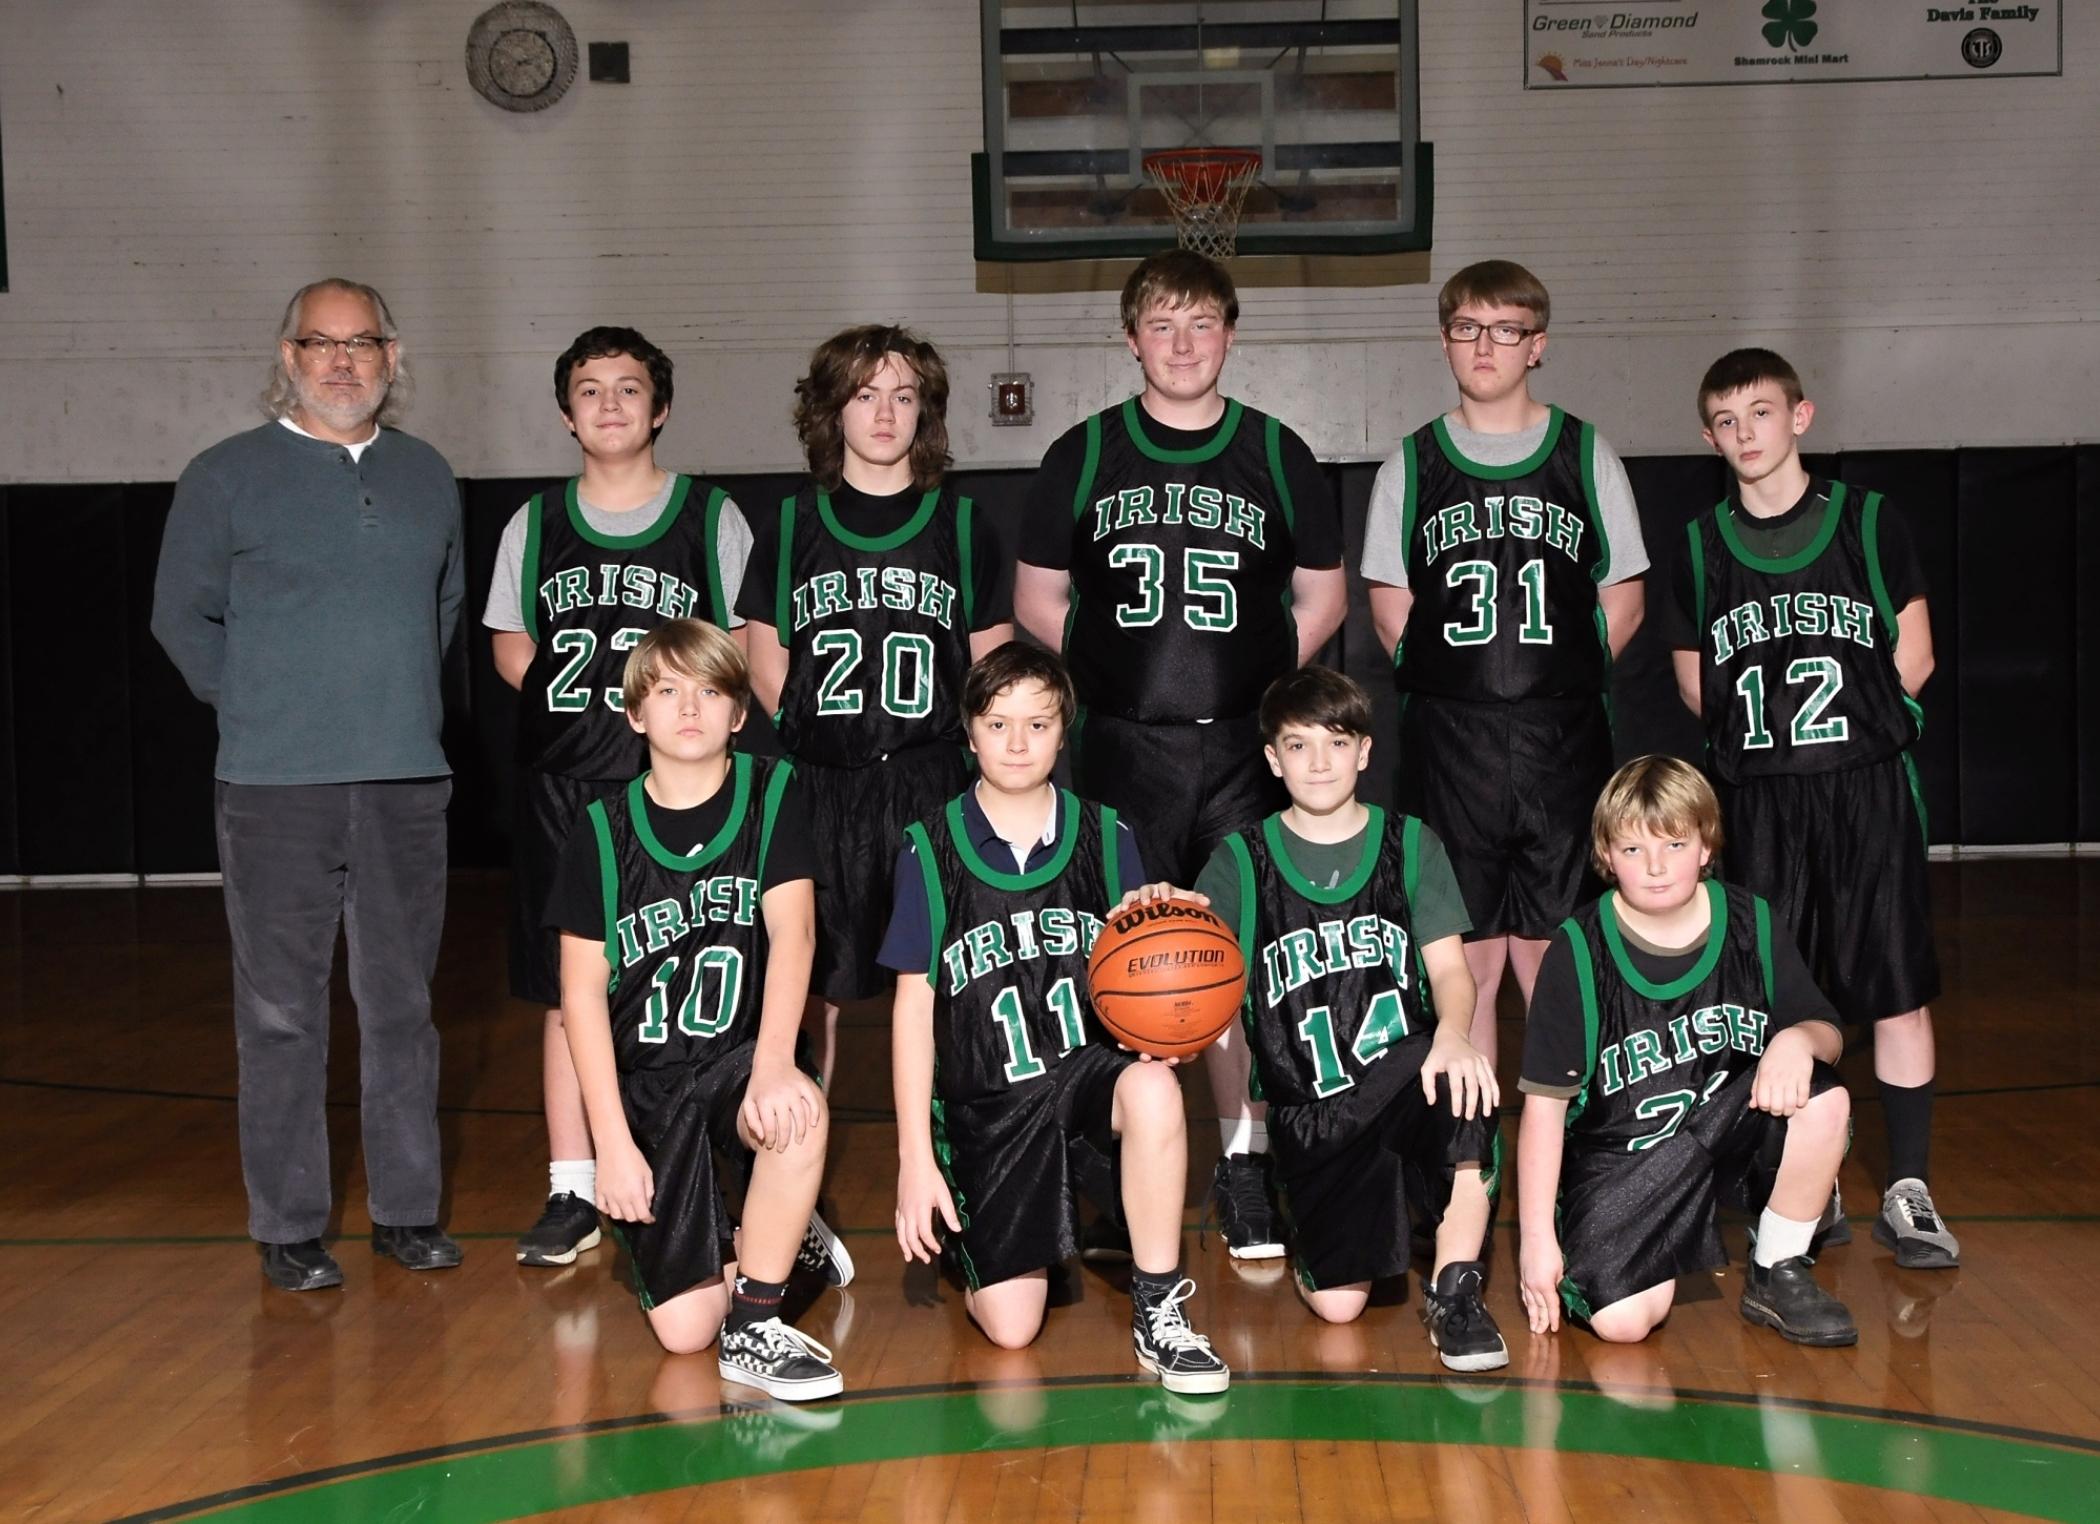 Riddle Junior High School boys basketball team photo.